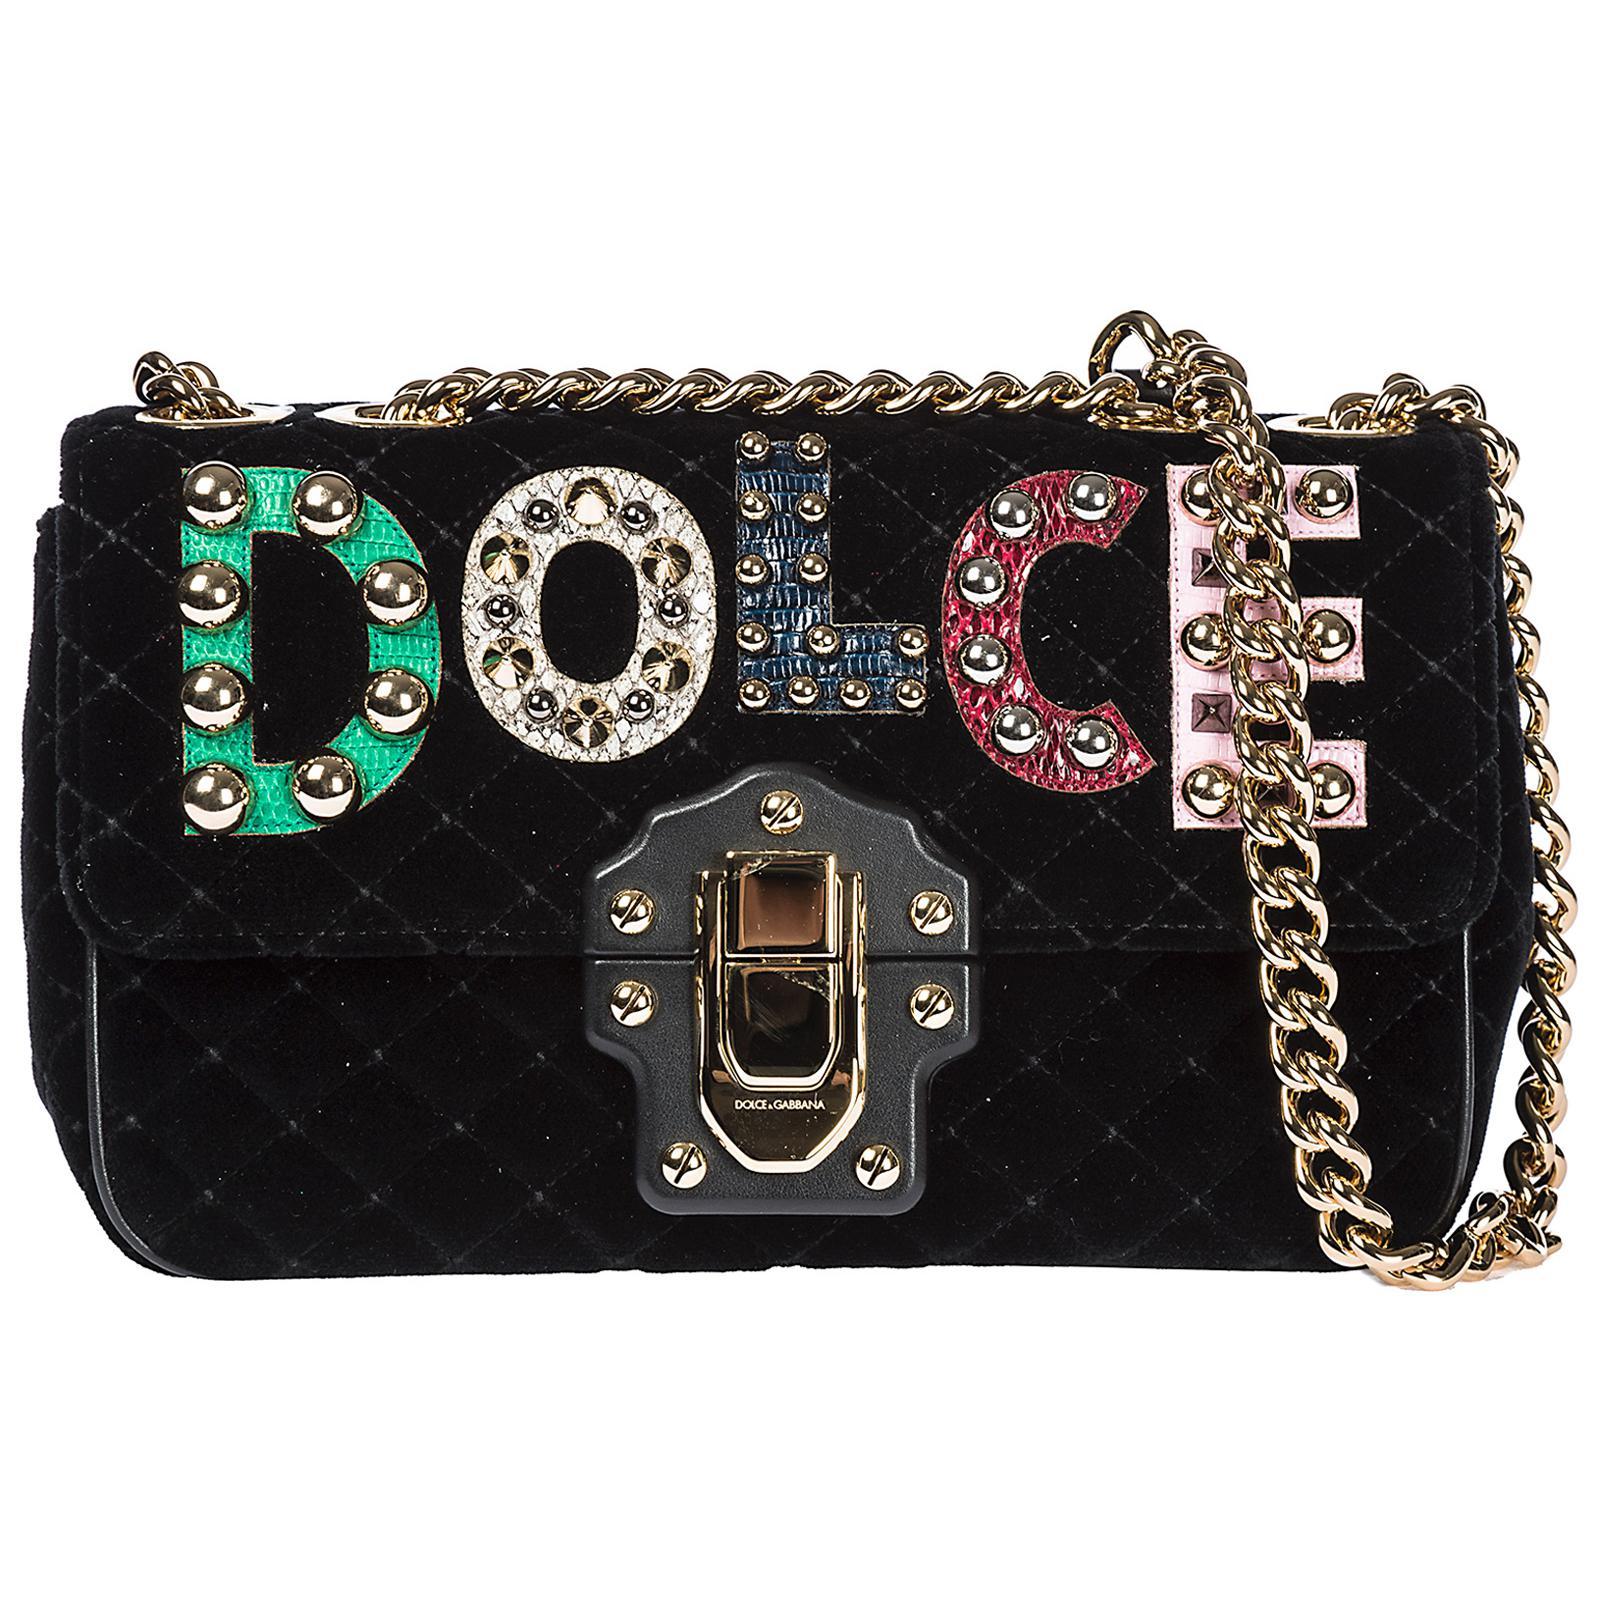 e2f3c4830cce Dolce   Gabbana Shoulder Bag Lucia in Black - Save ...